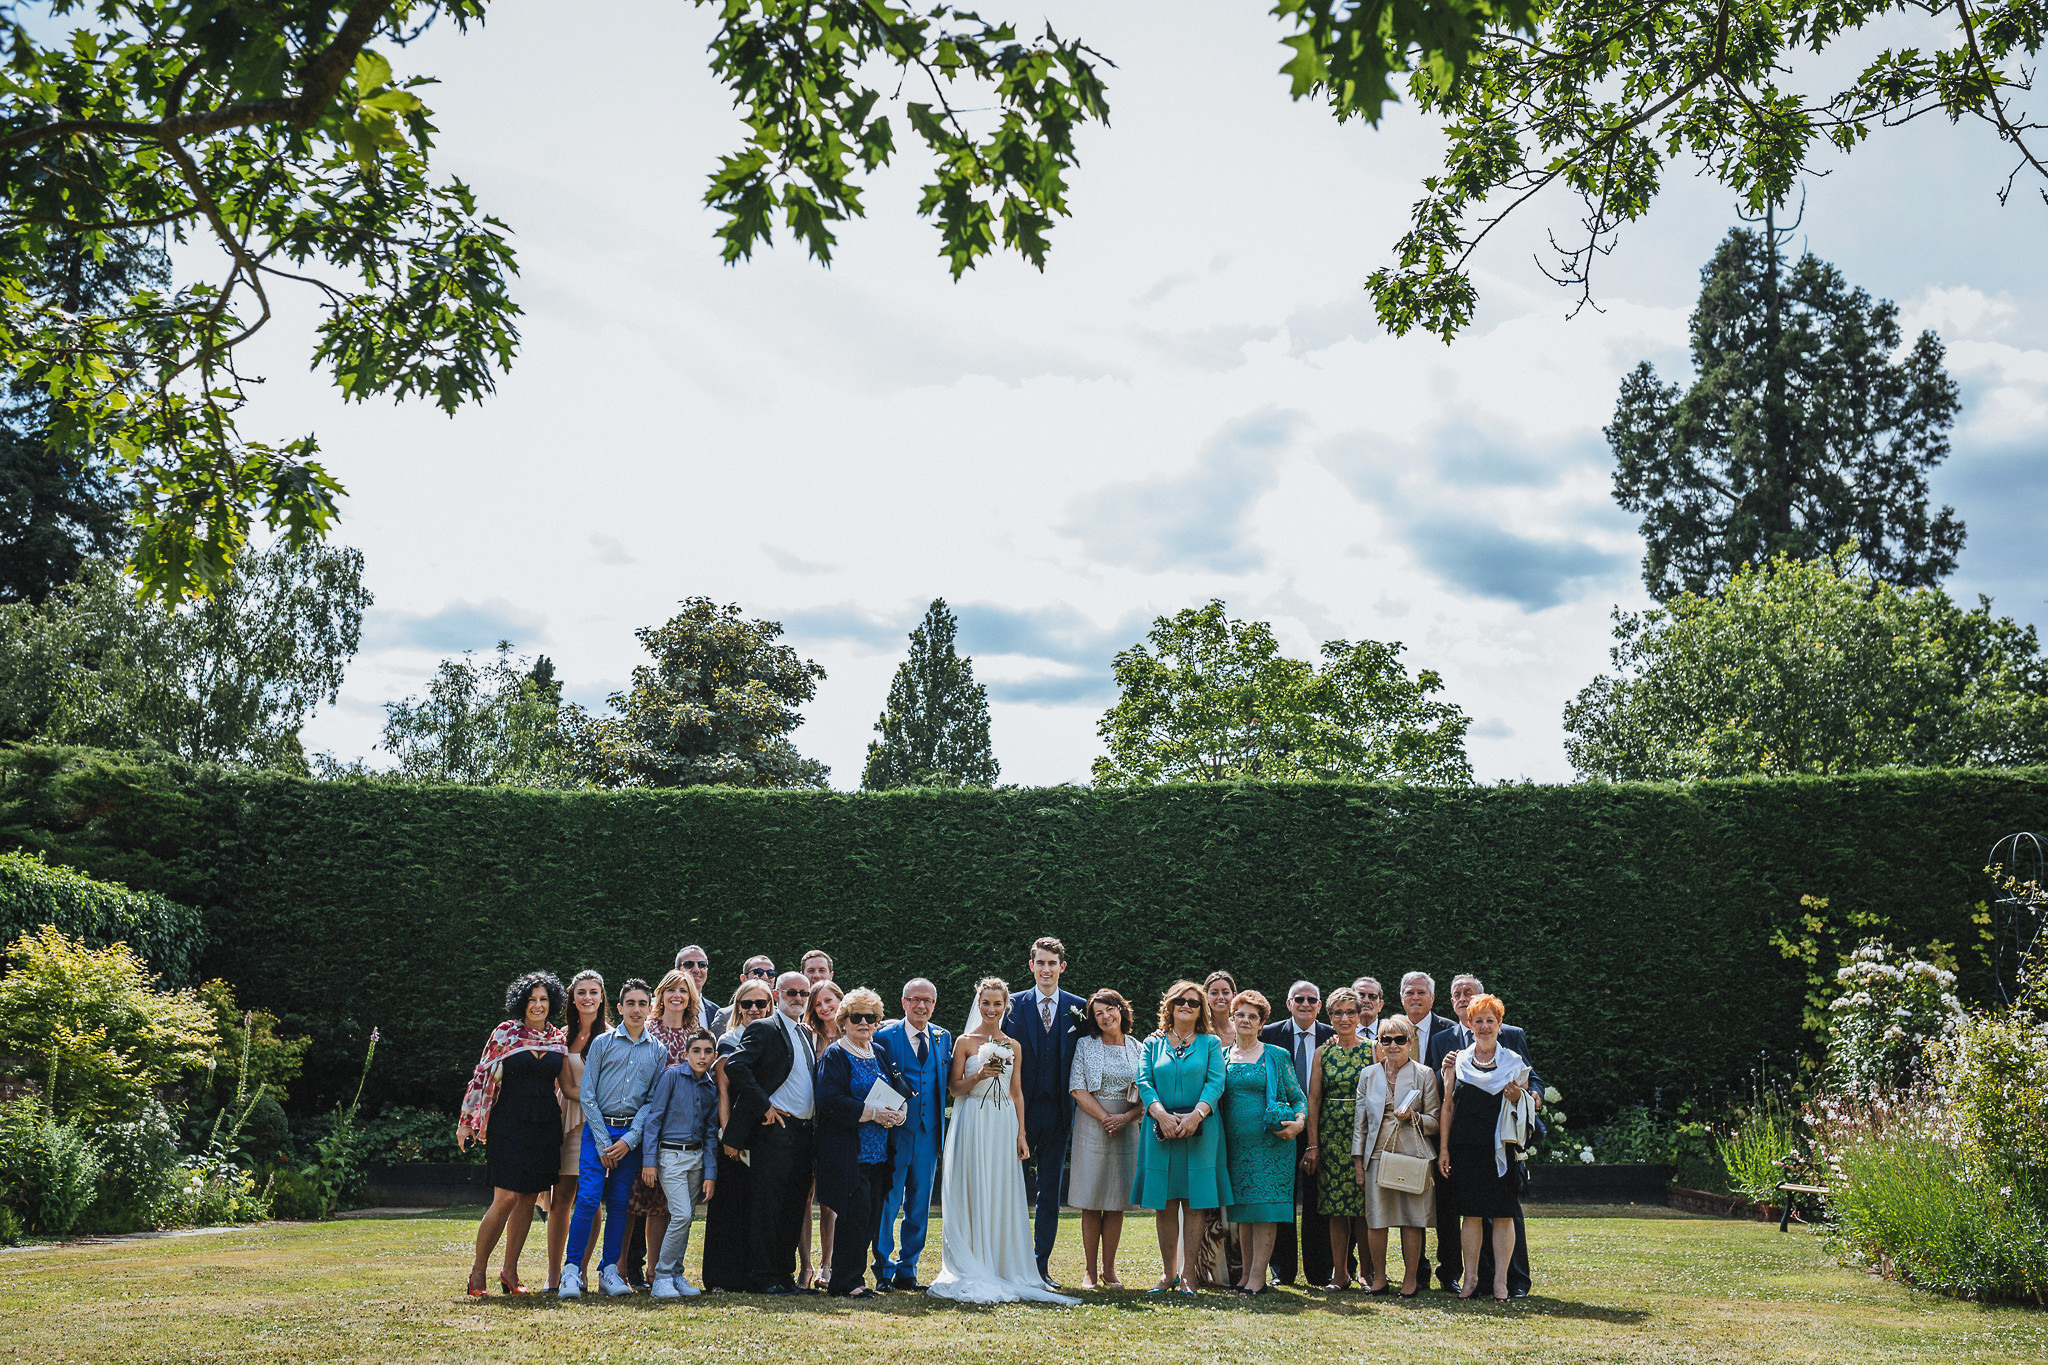 paul-marbrook-Gaynes-Park Wedding-Photographer-90087